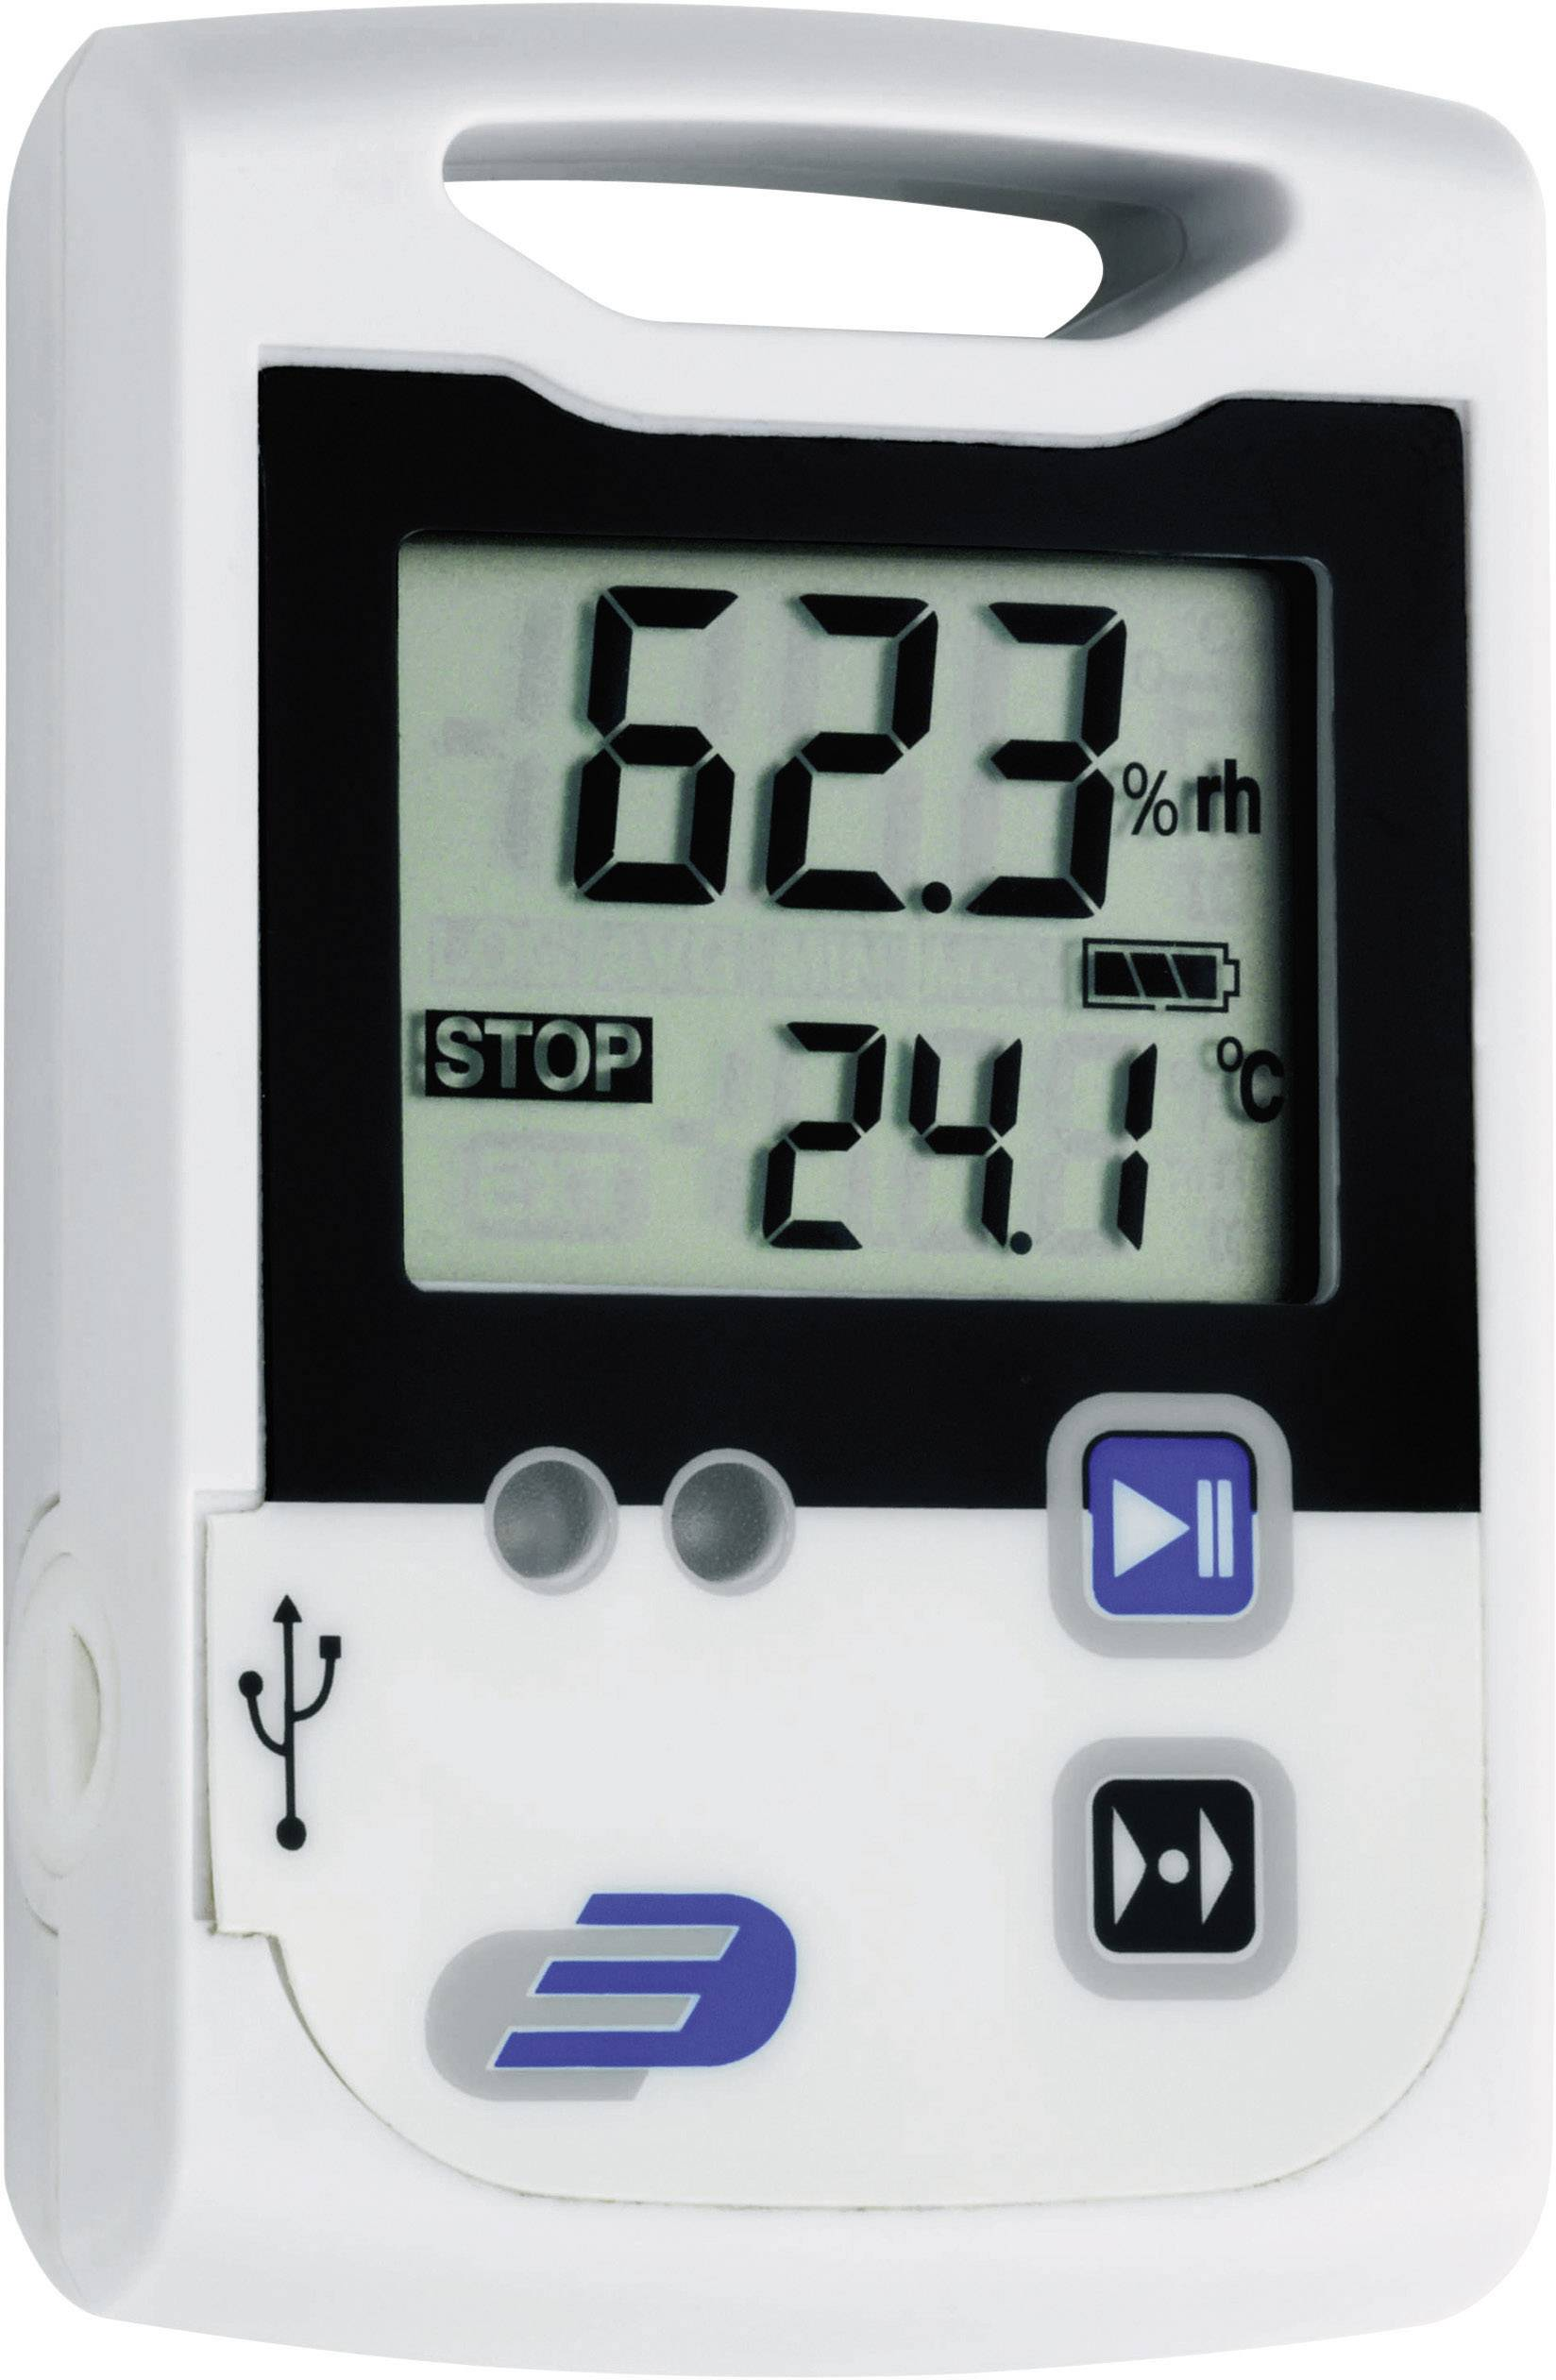 Teplotný datalogger Dostmann Electronic LOG100, -30 až +70 °C